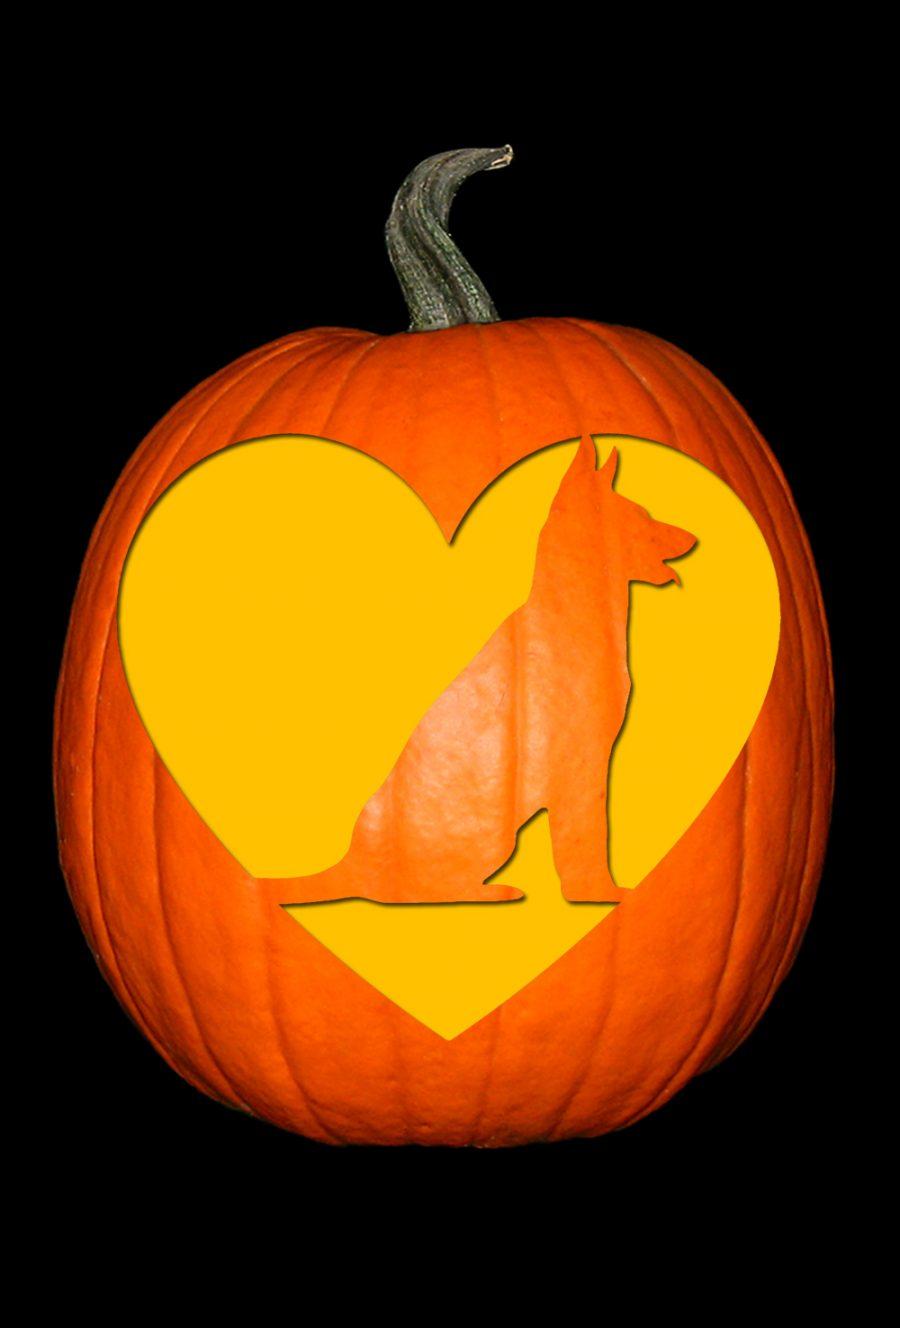 Love My German Shepherd 2 Pumpkin